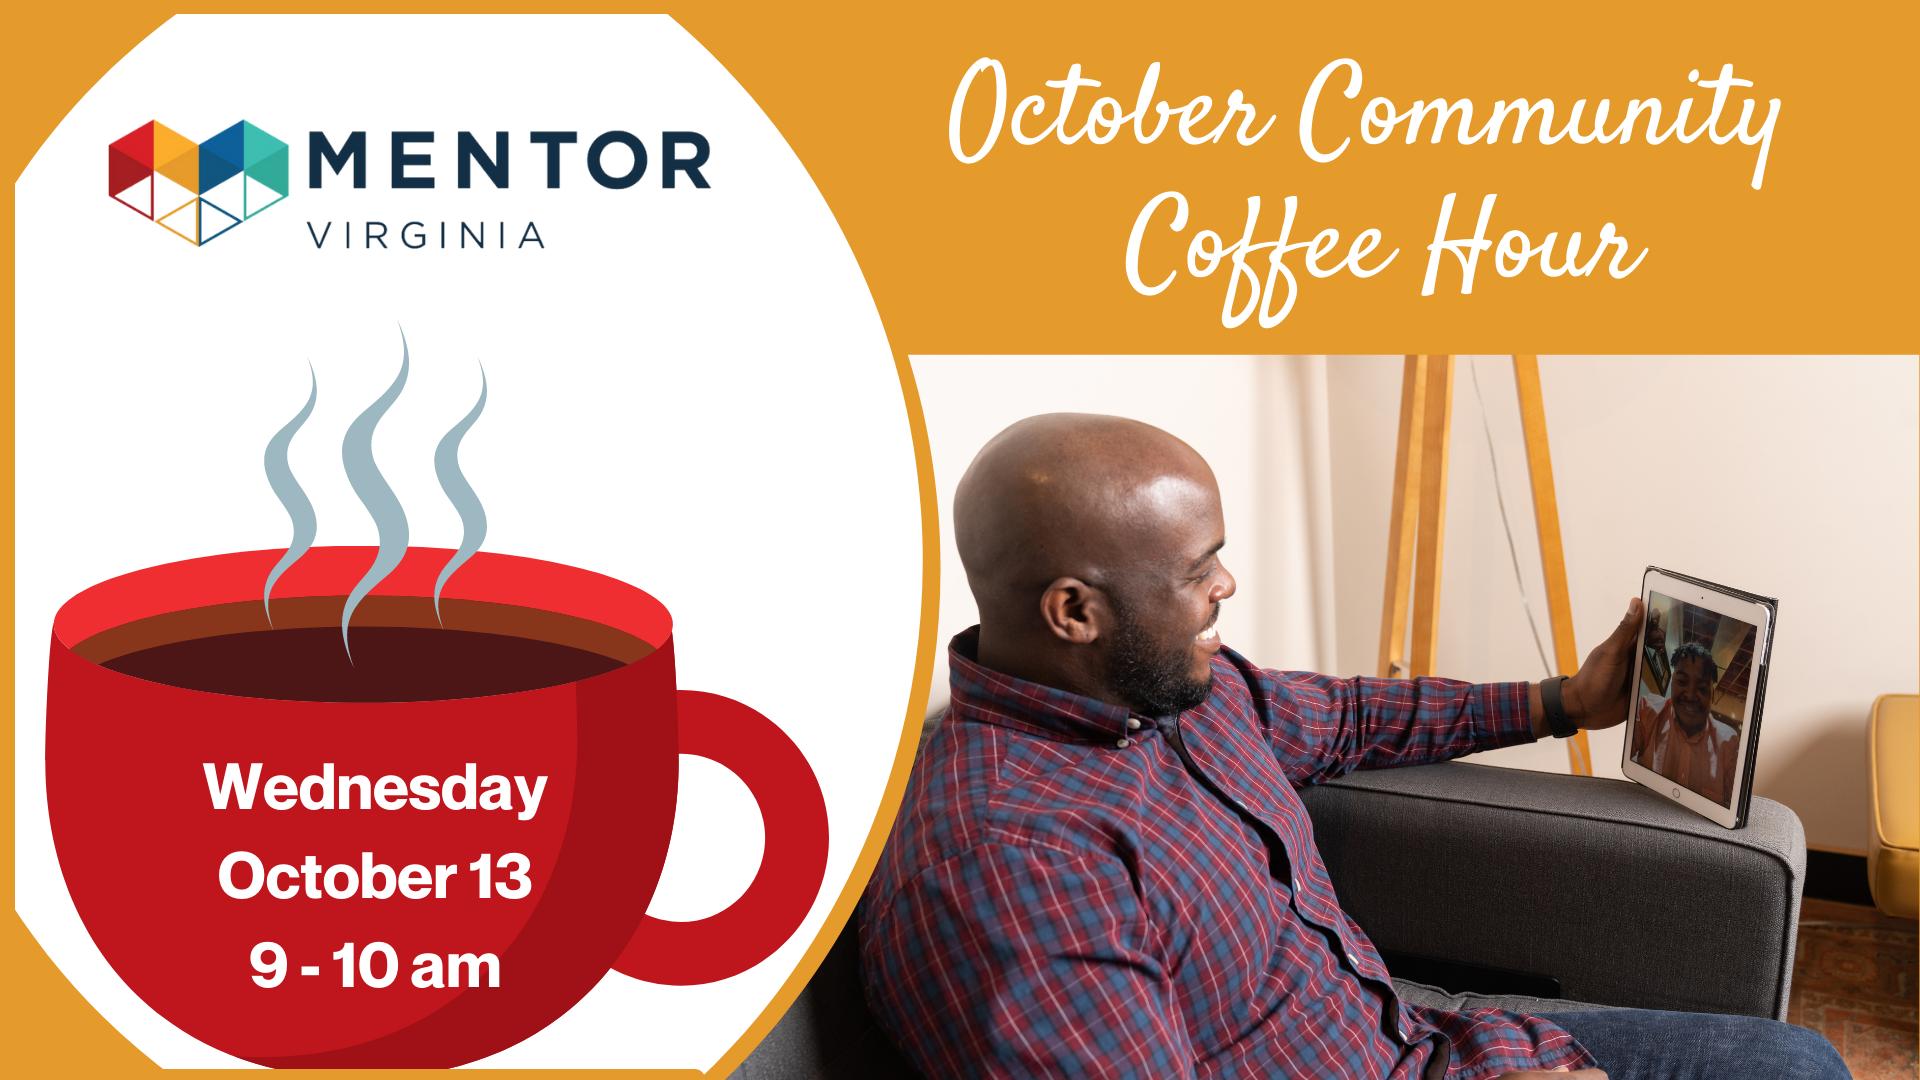 October Community Coffee Hour